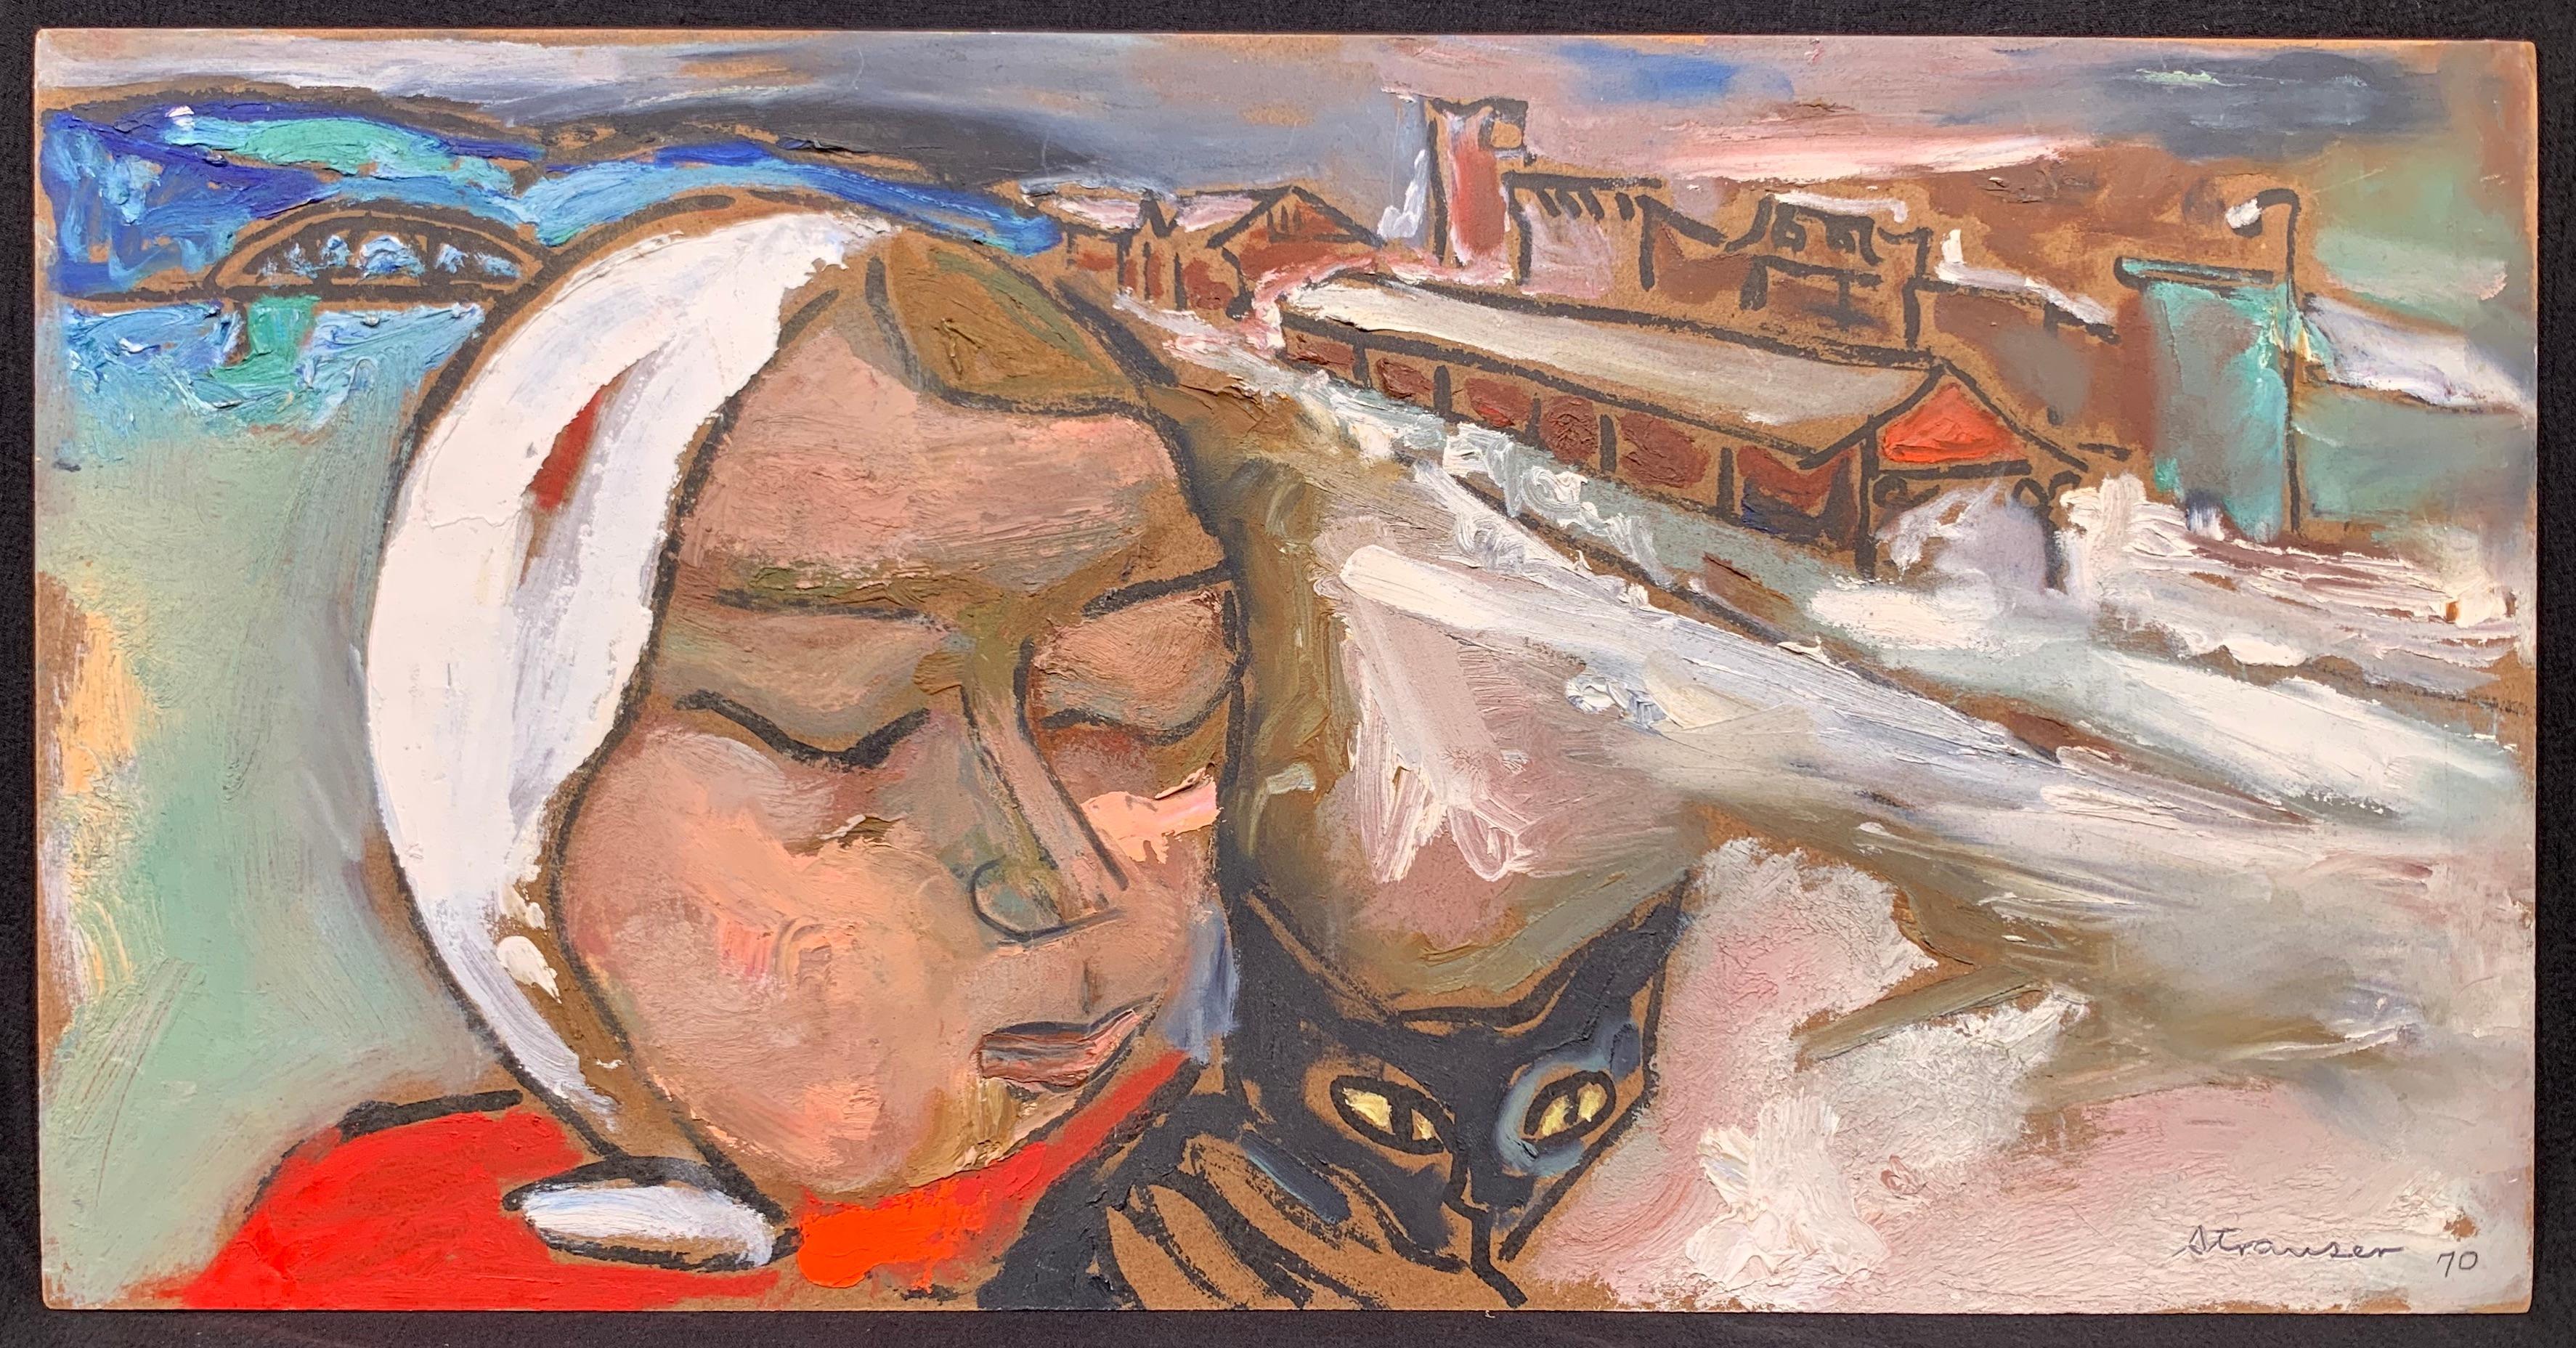 Winter Walk with Jasper, (Black Cat painting)